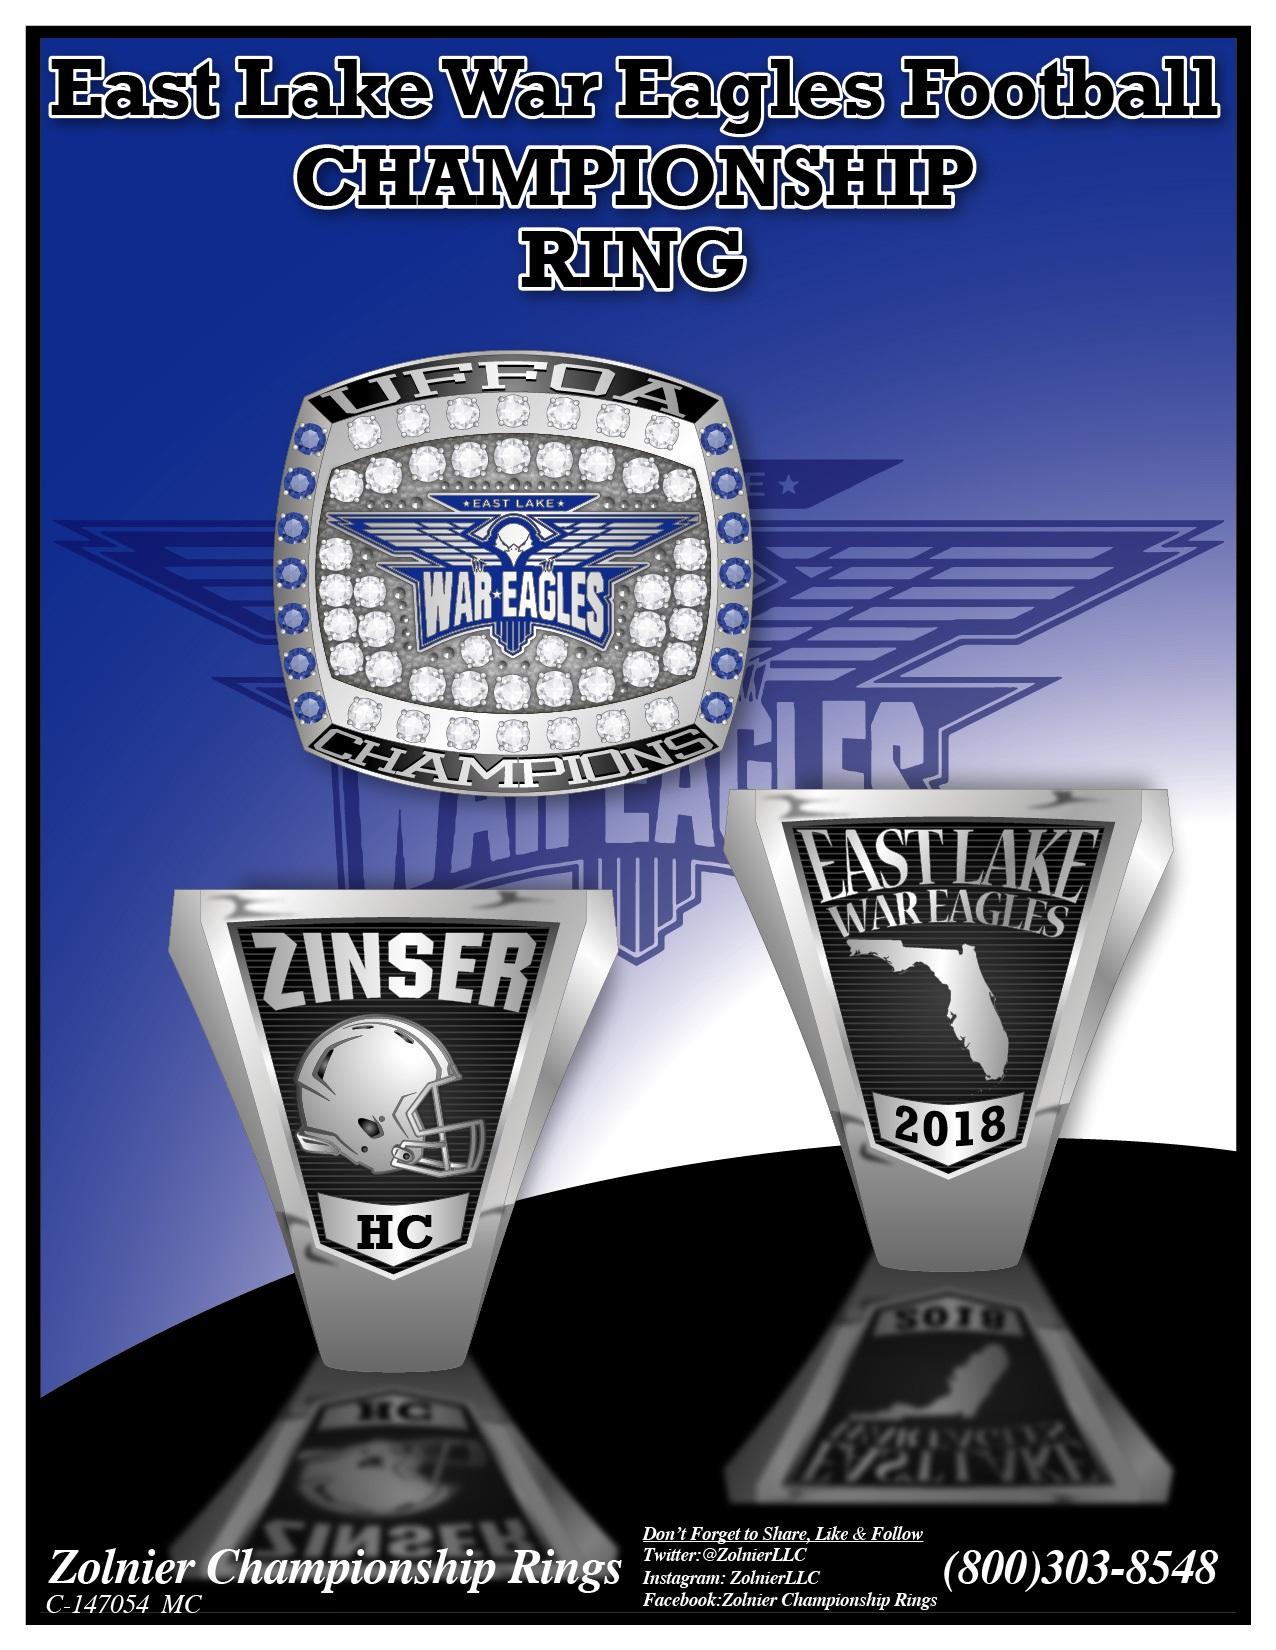 C-147054 East Lake War Eagles Football Champ Ring